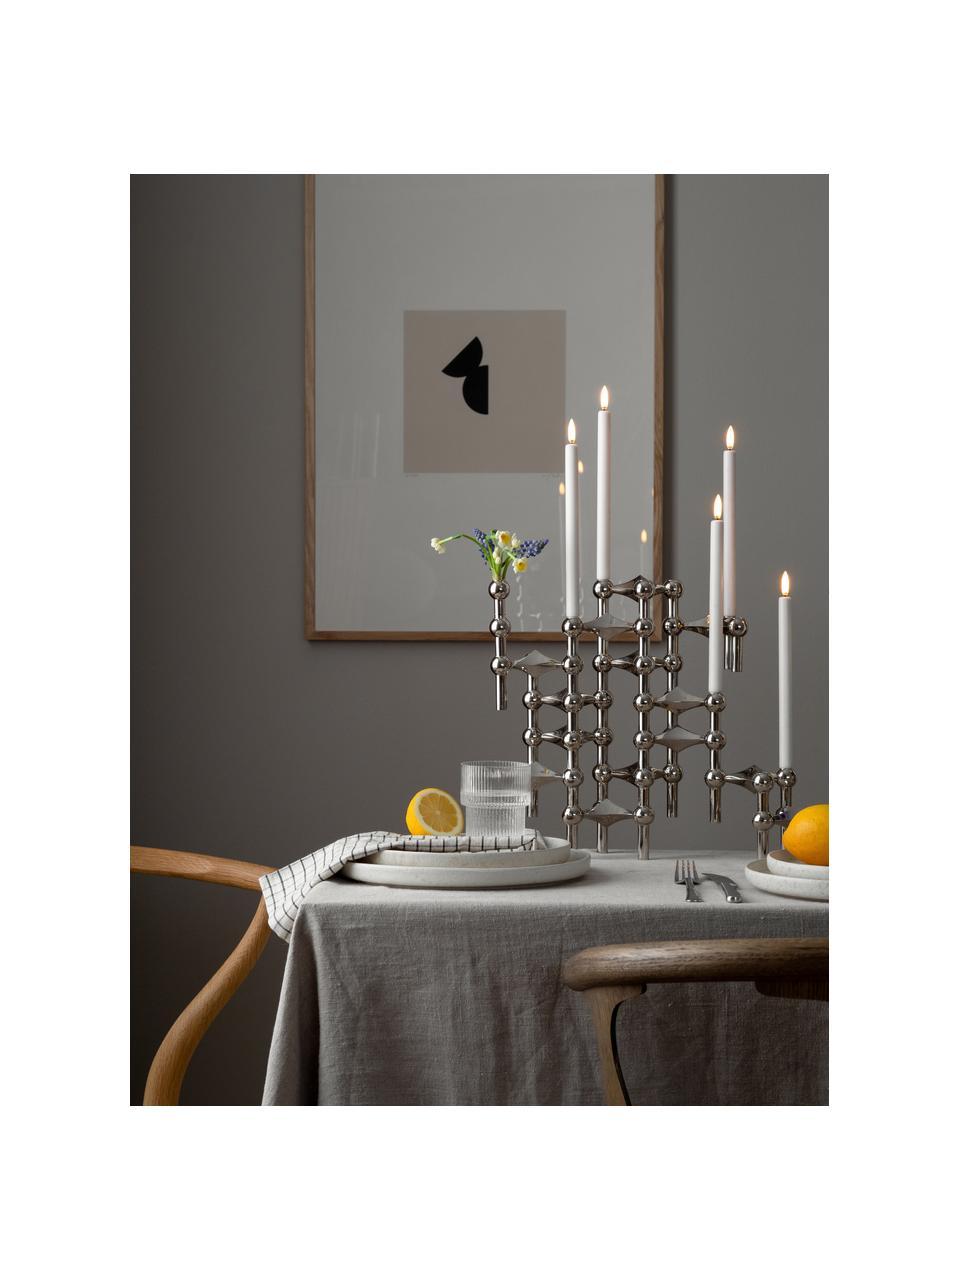 Chandelle LED Uyuni Lighting, 2pièces, Blanc